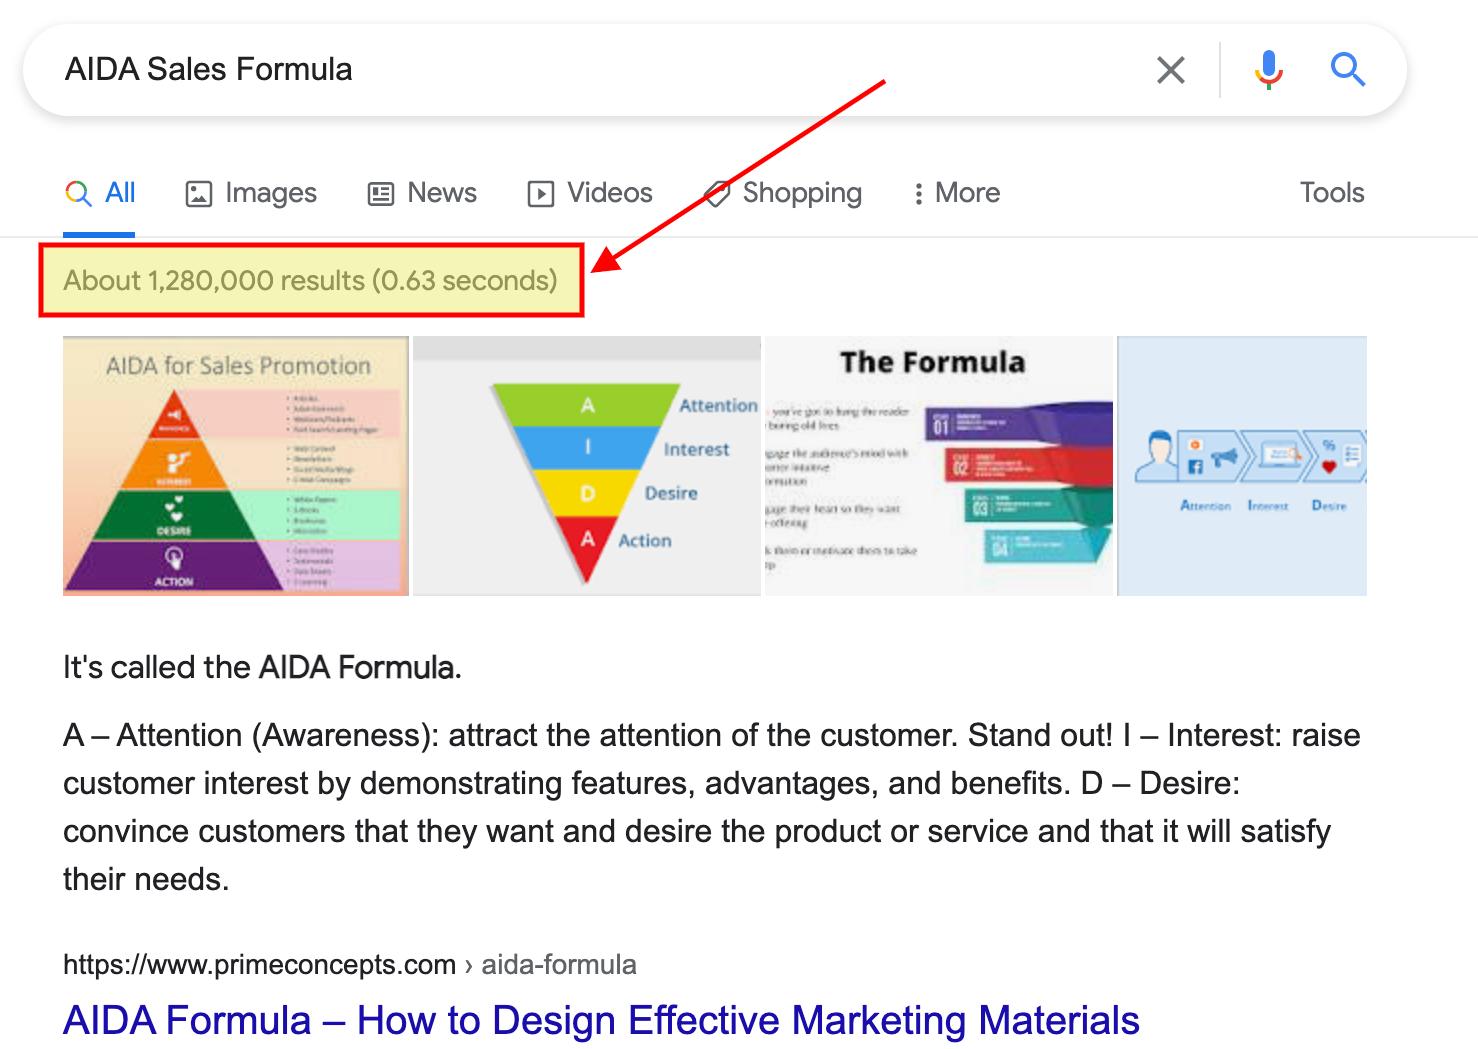 Google AIDA Sales Formula